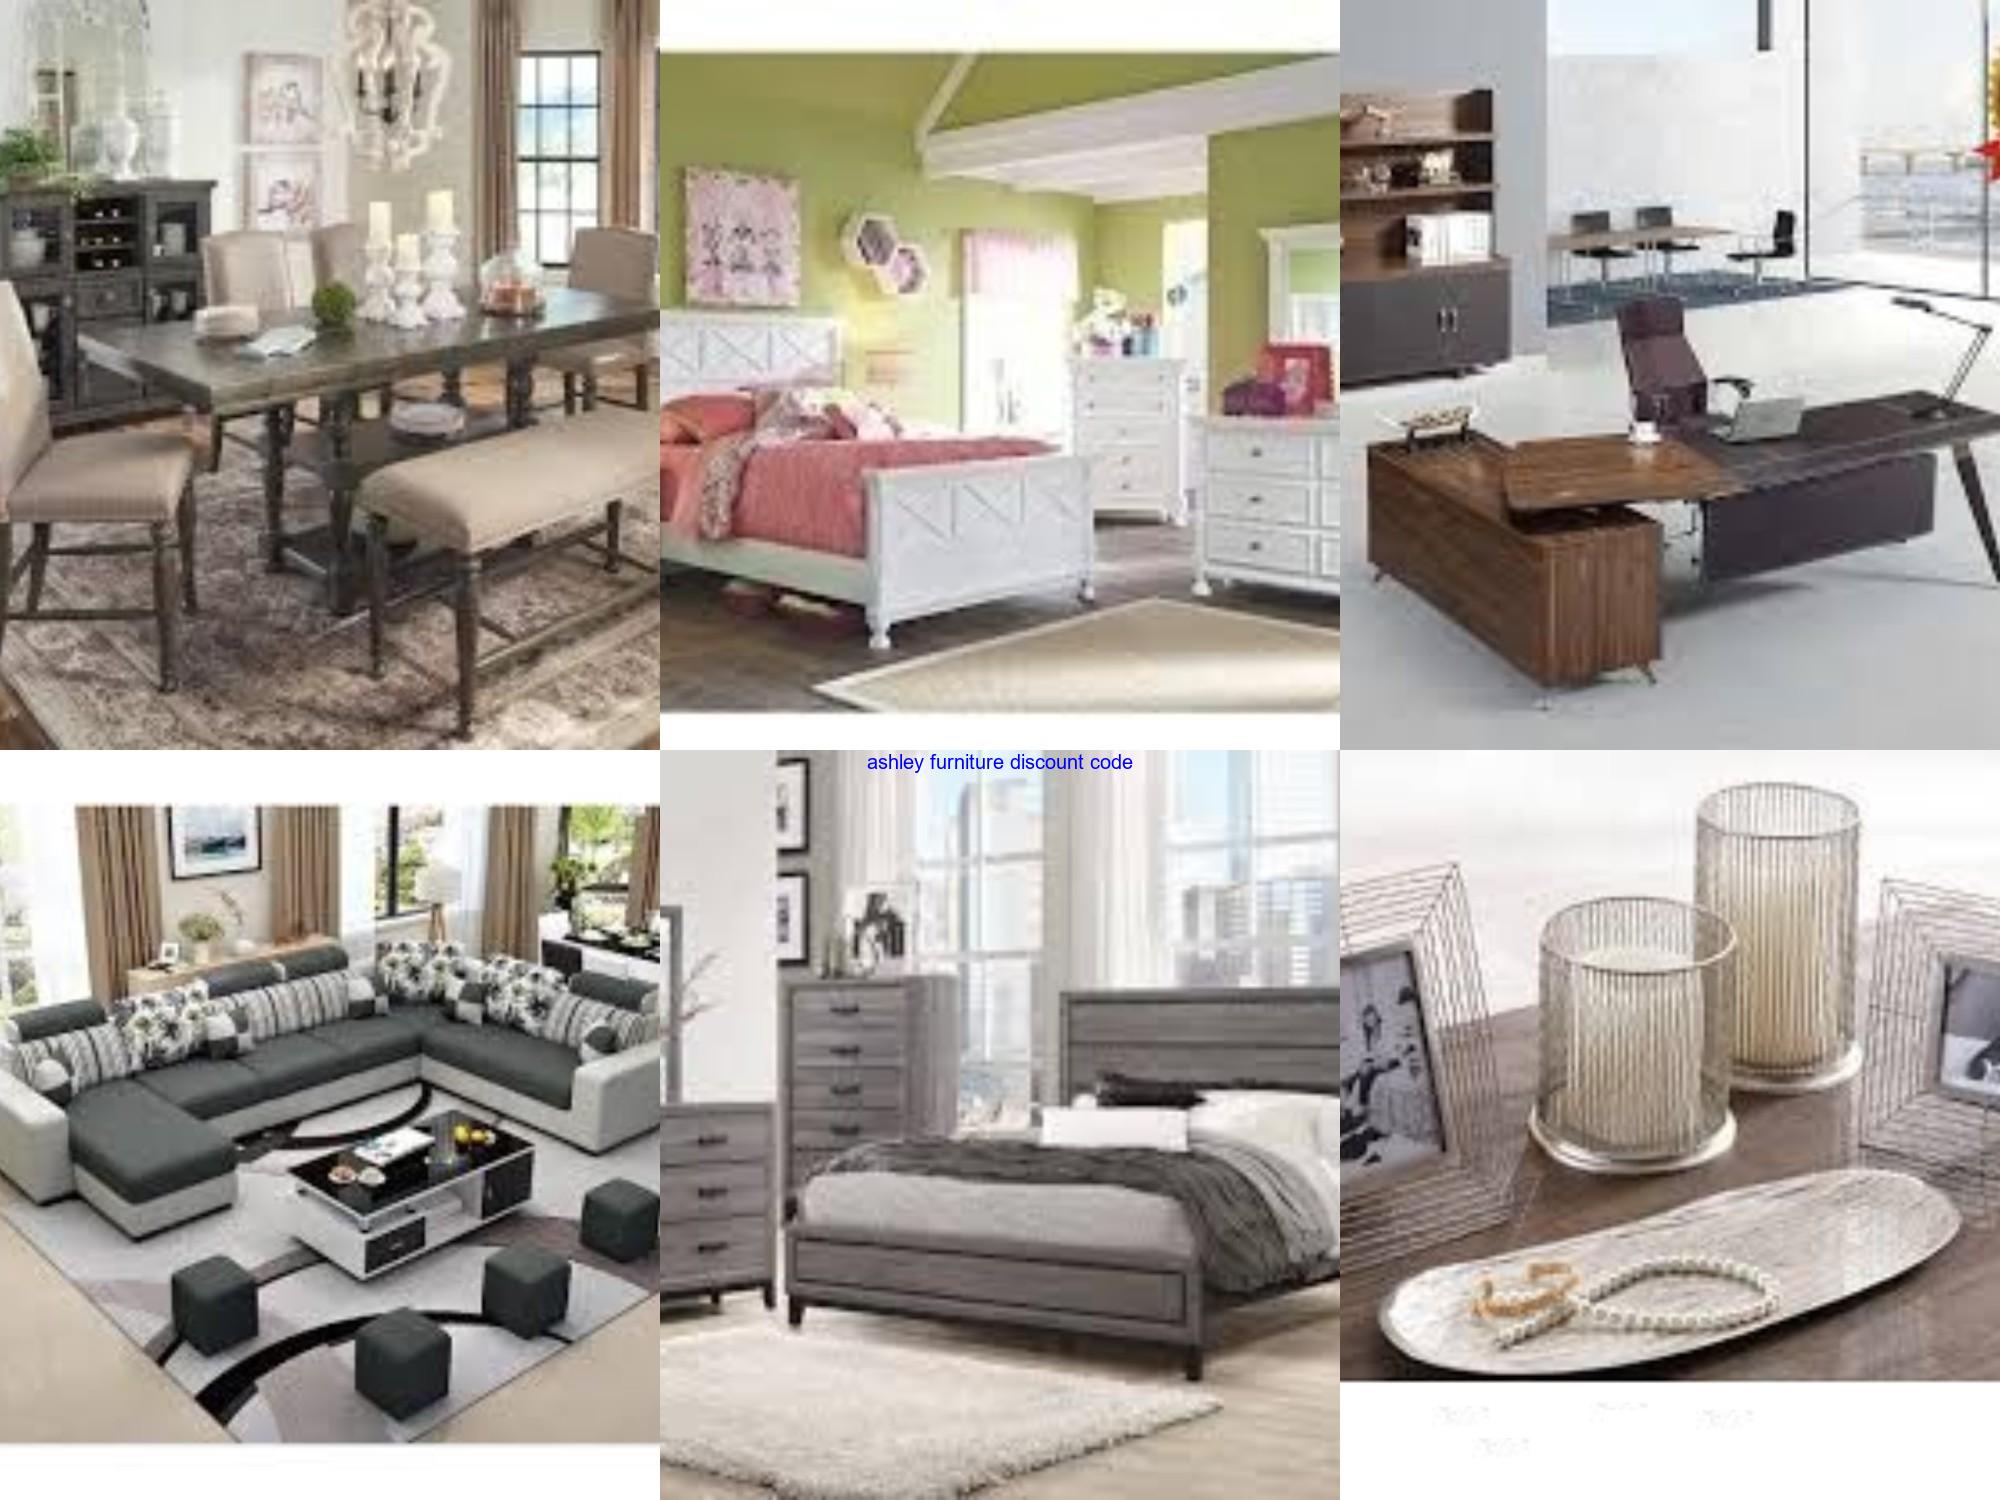 Ashley Furniture Discount Code Furniture Prices Furniture Wholesale Furniture